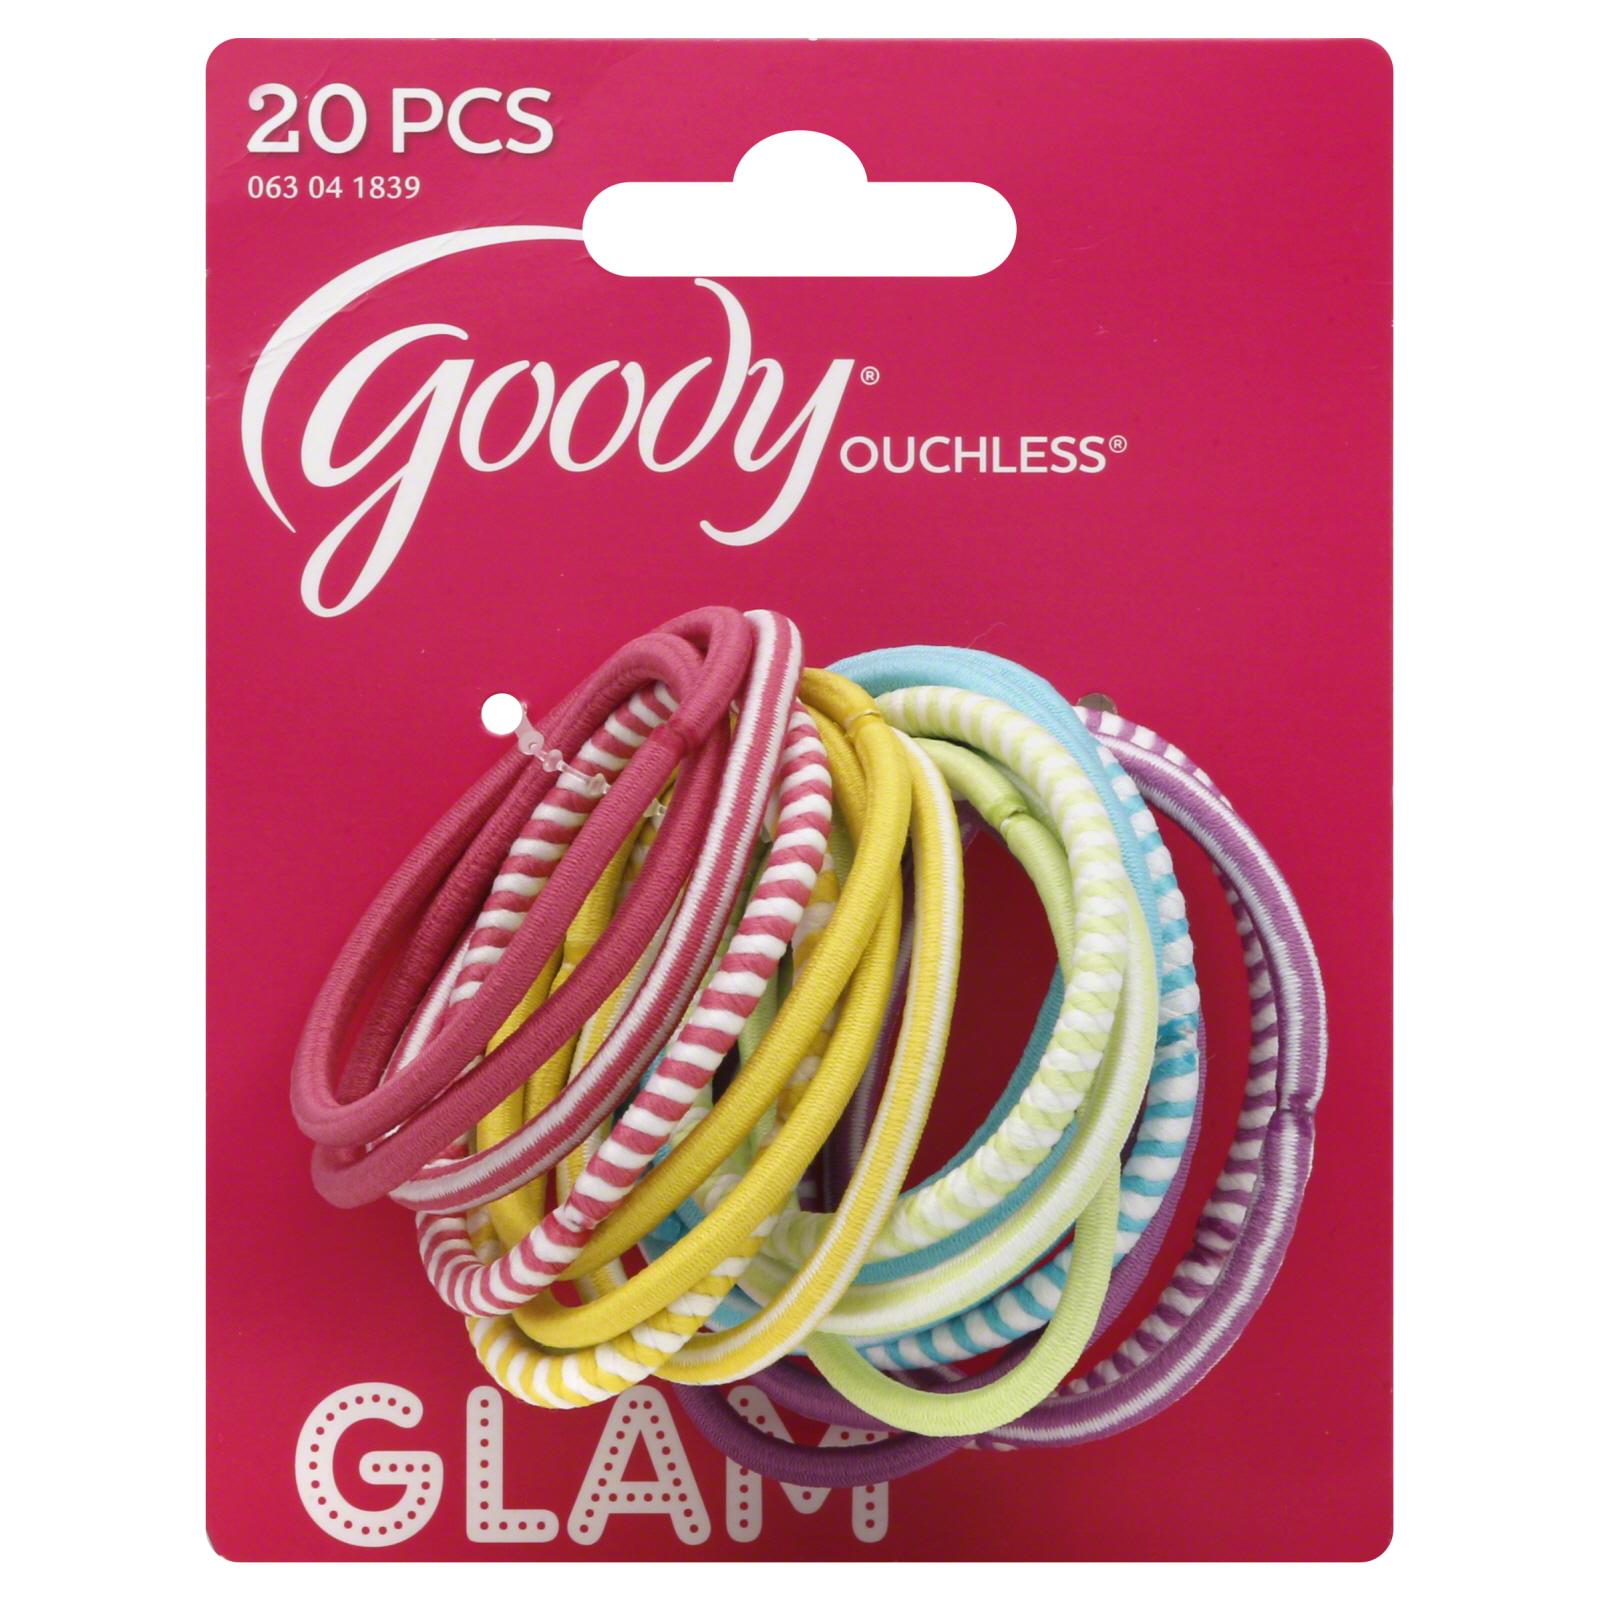 Goody Ouchless Girls Pastel Elastics, 20 pcs PartNumber: 038W006391133001P KsnValue: 6391133 MfgPartNumber: 1884105